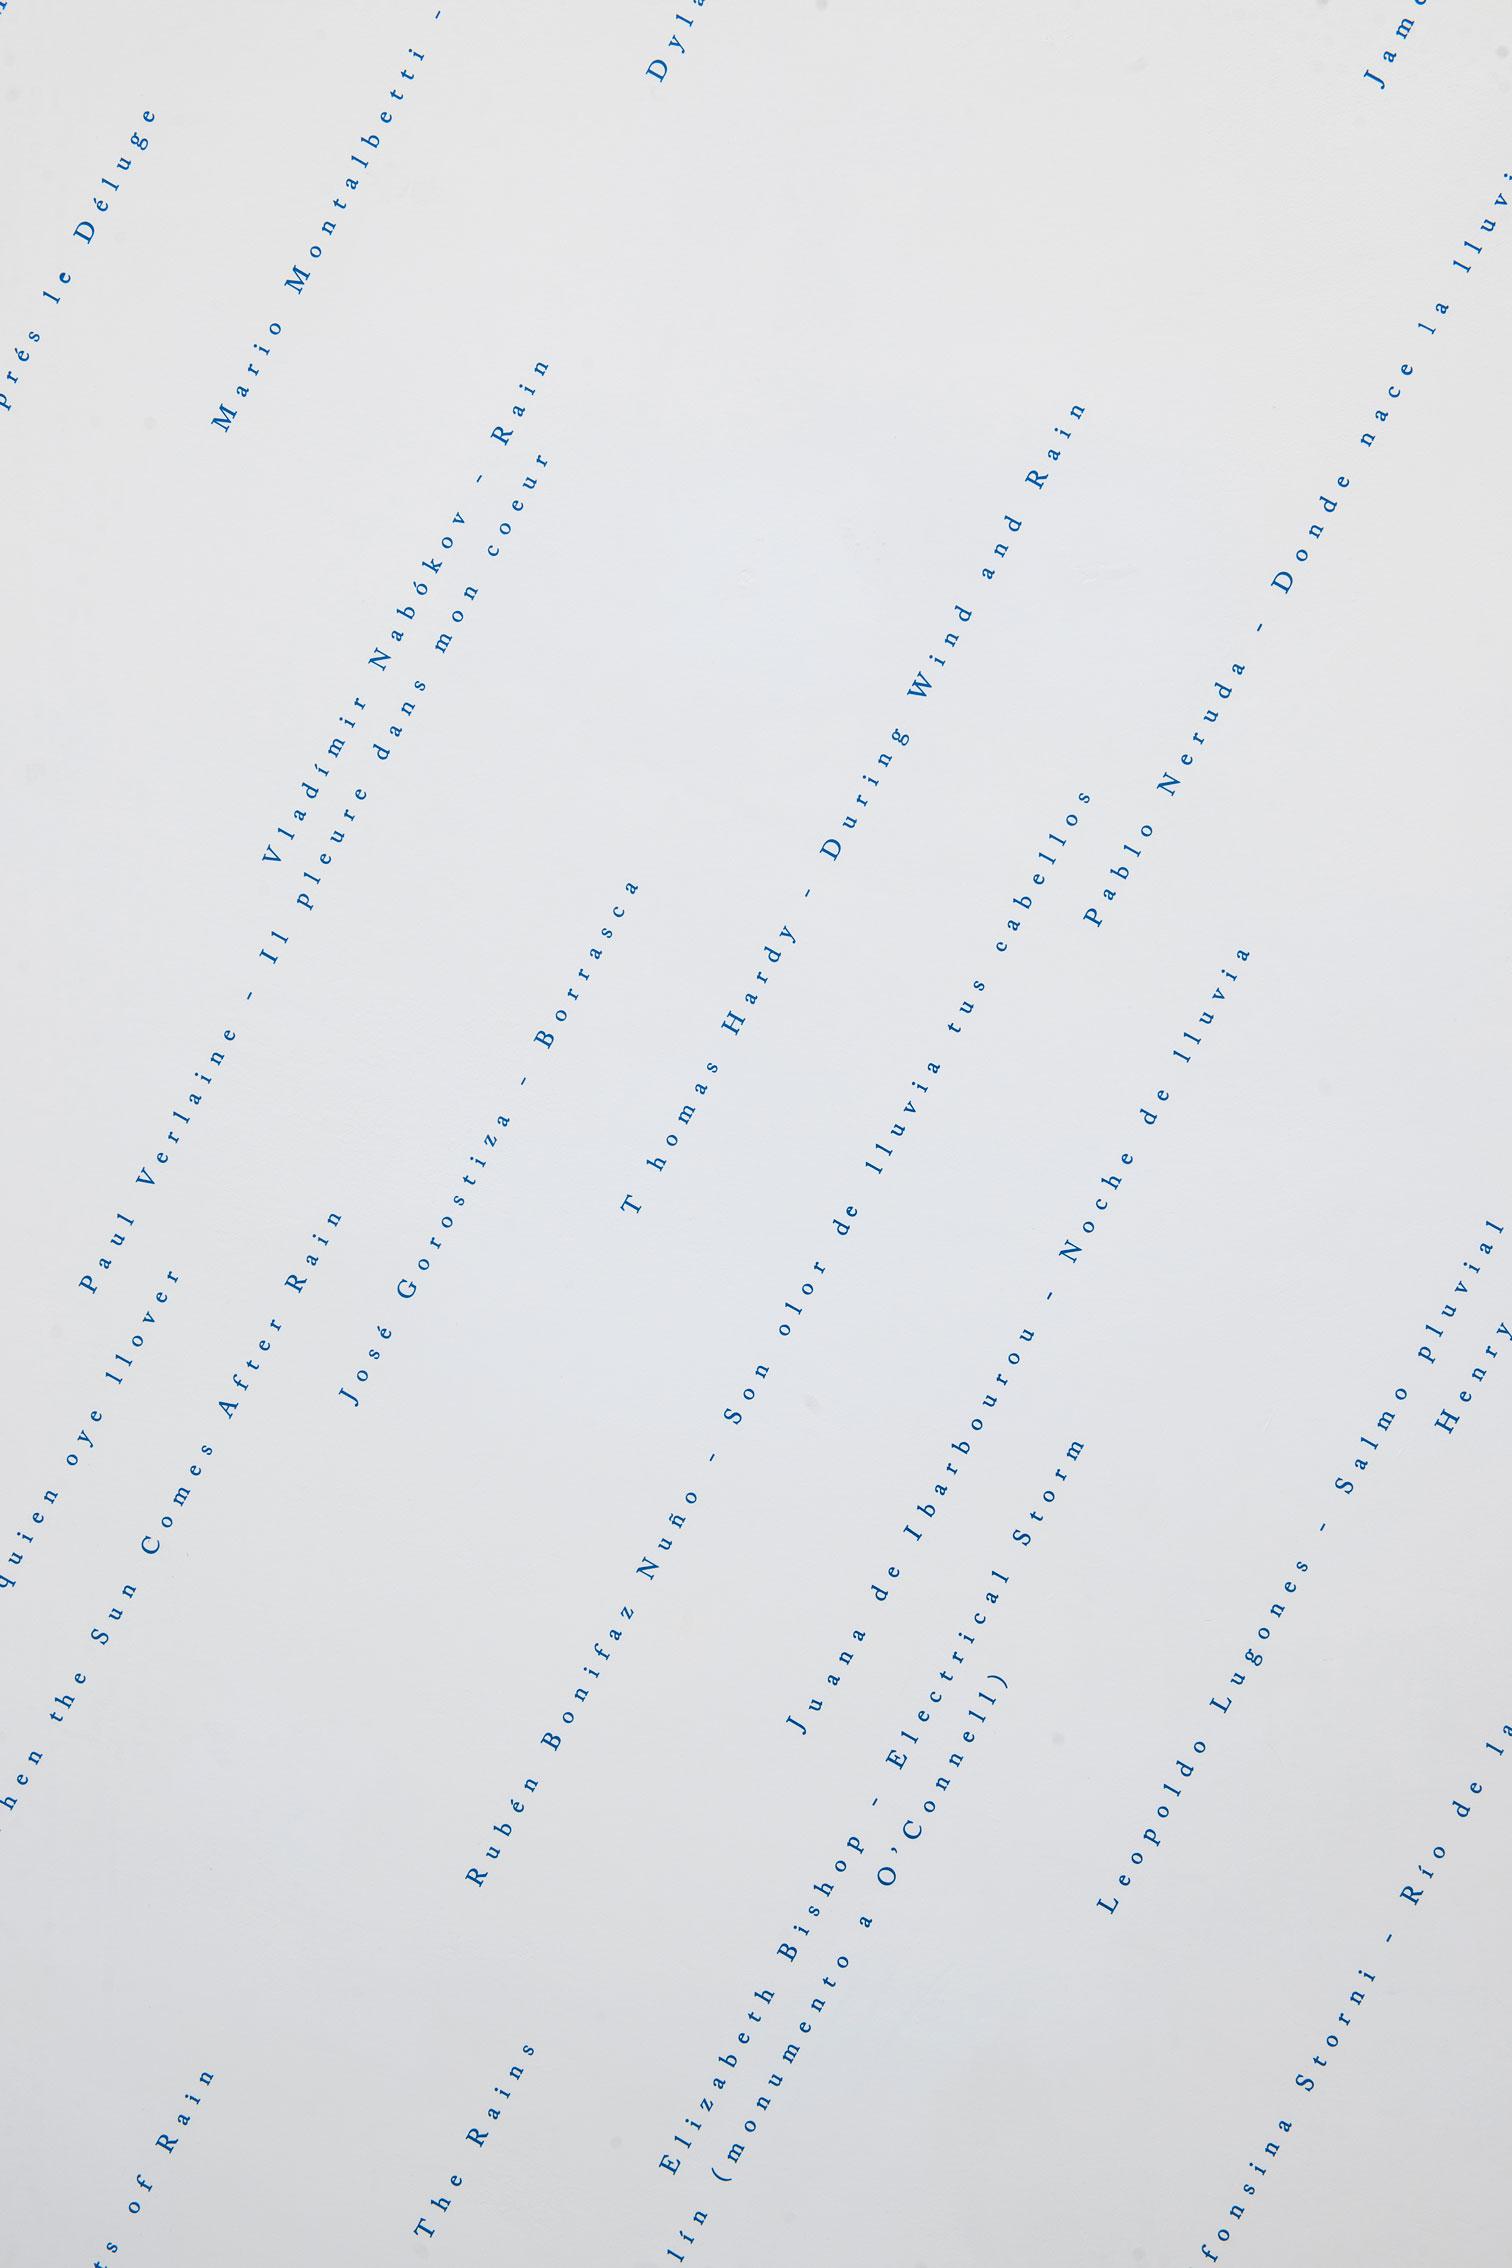 Está lloviendo (una antología)/It's Raining (An Anthology),   2017  Vinil / Vinyl  Dimensiones variables / Dimensions variable  Detalle / Detail